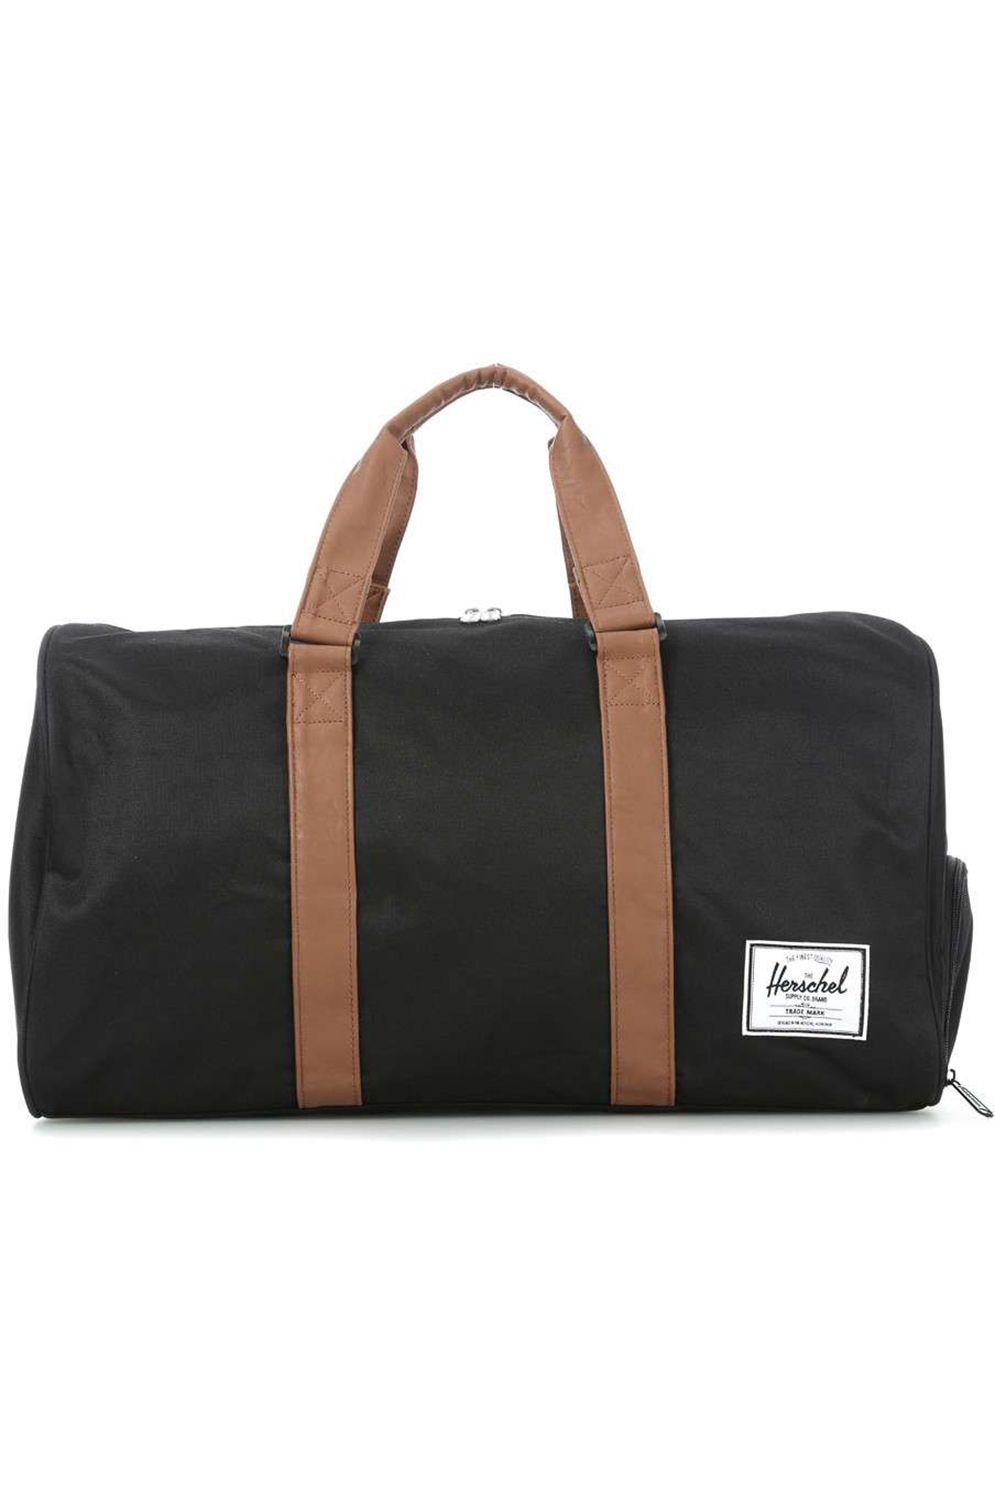 Herschel Bag NOVEL Black/Tan